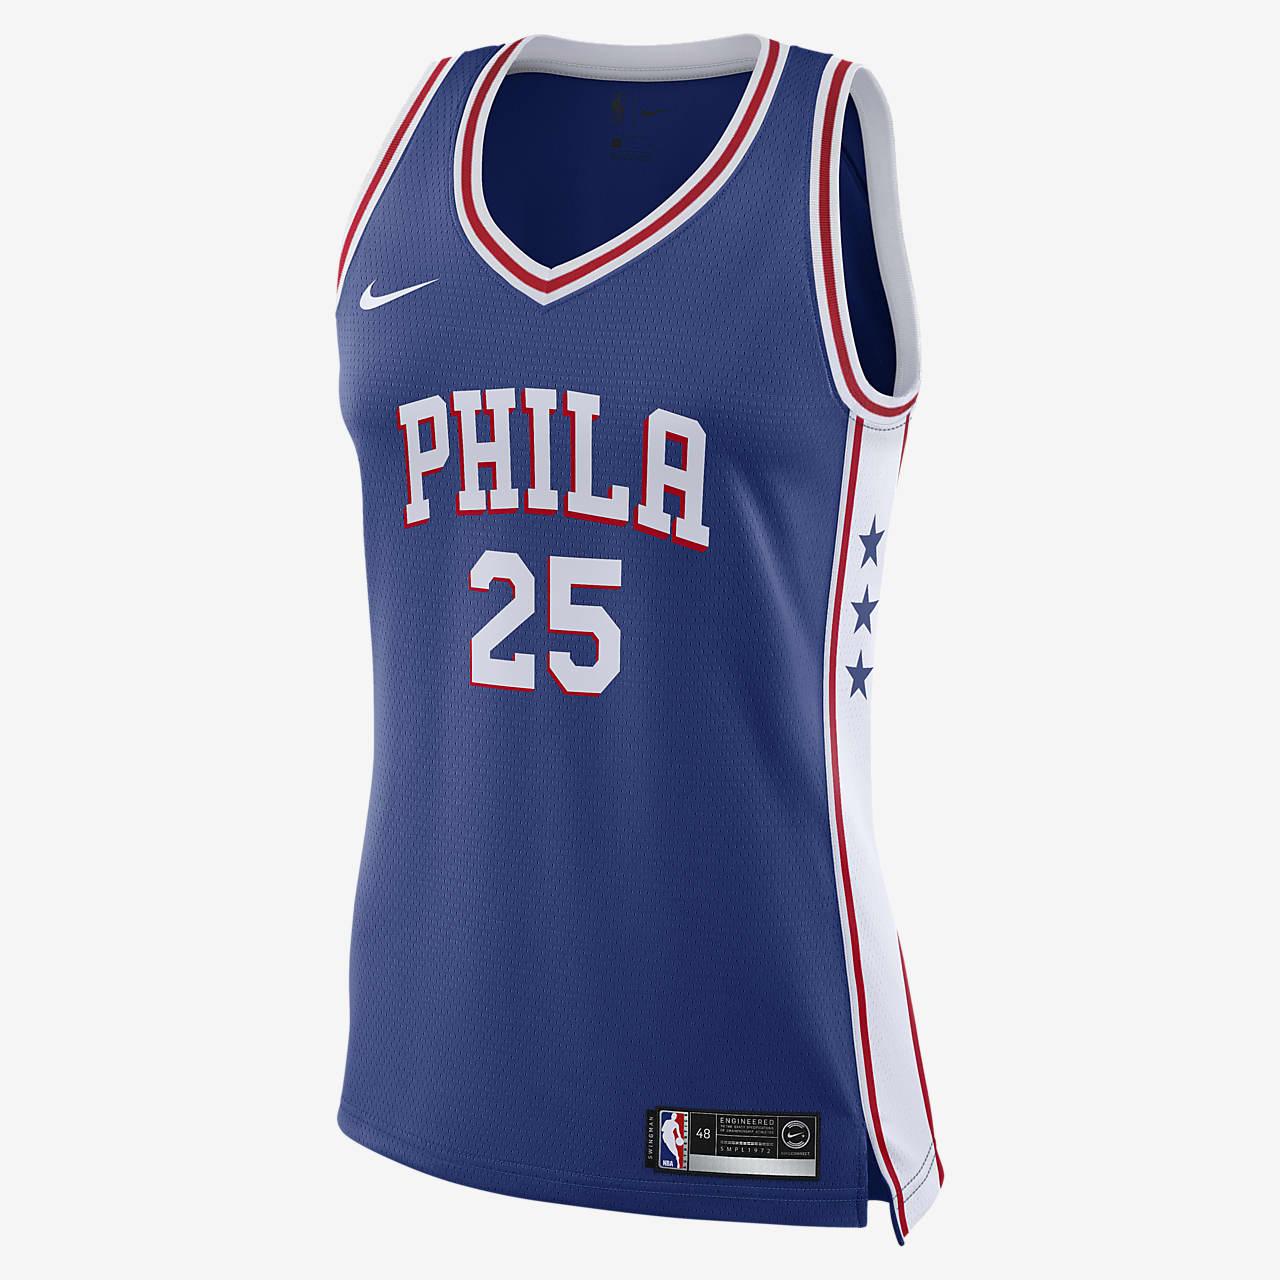 Ben Simmons 76ers Icon Edition Women's Nike NBA Swingman Jersey